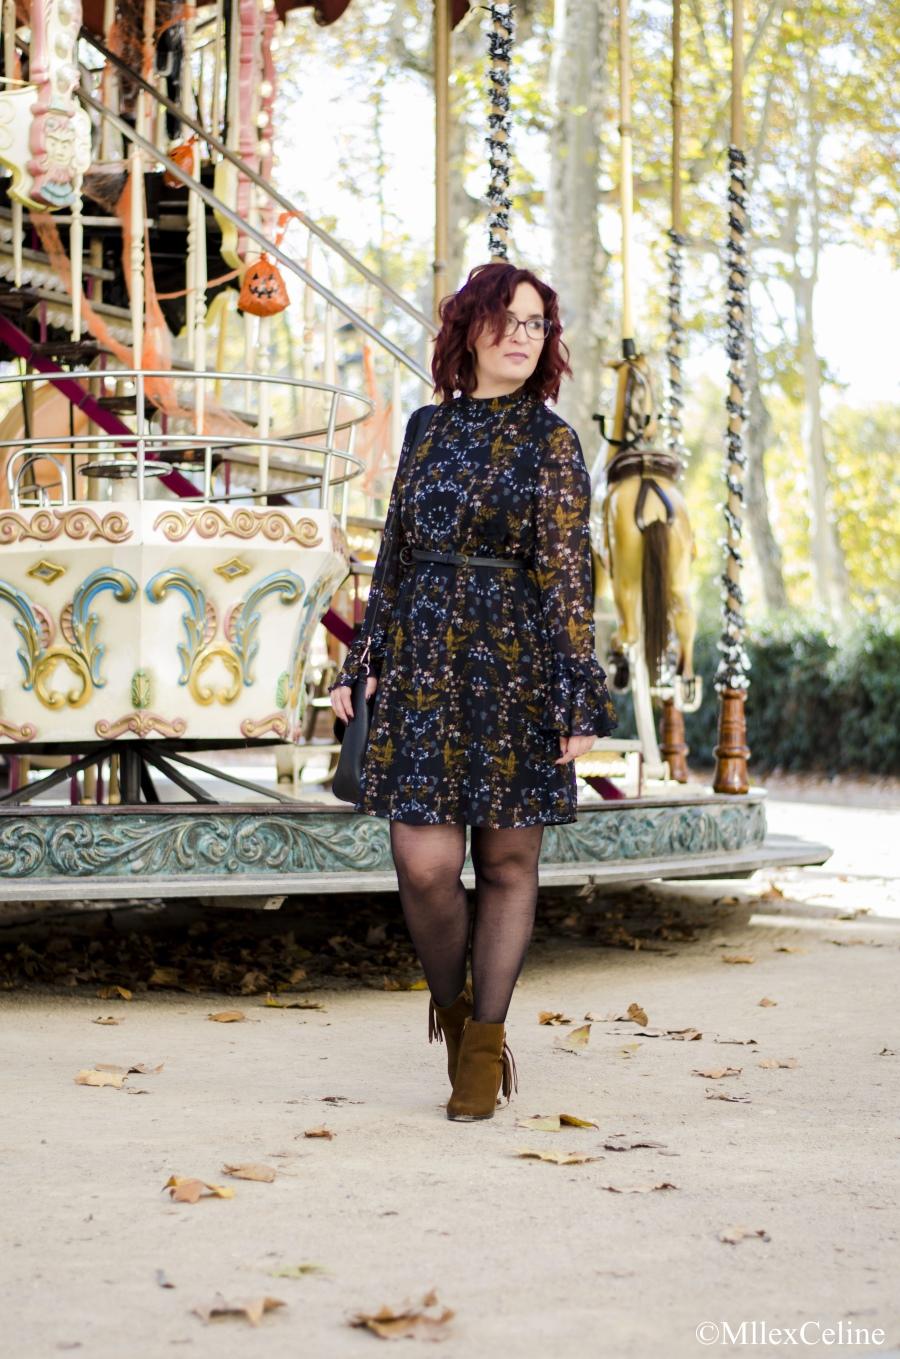 look-robe-kiabi-carrousel-automne-blog-mode-beaute-lifestyle-lyon